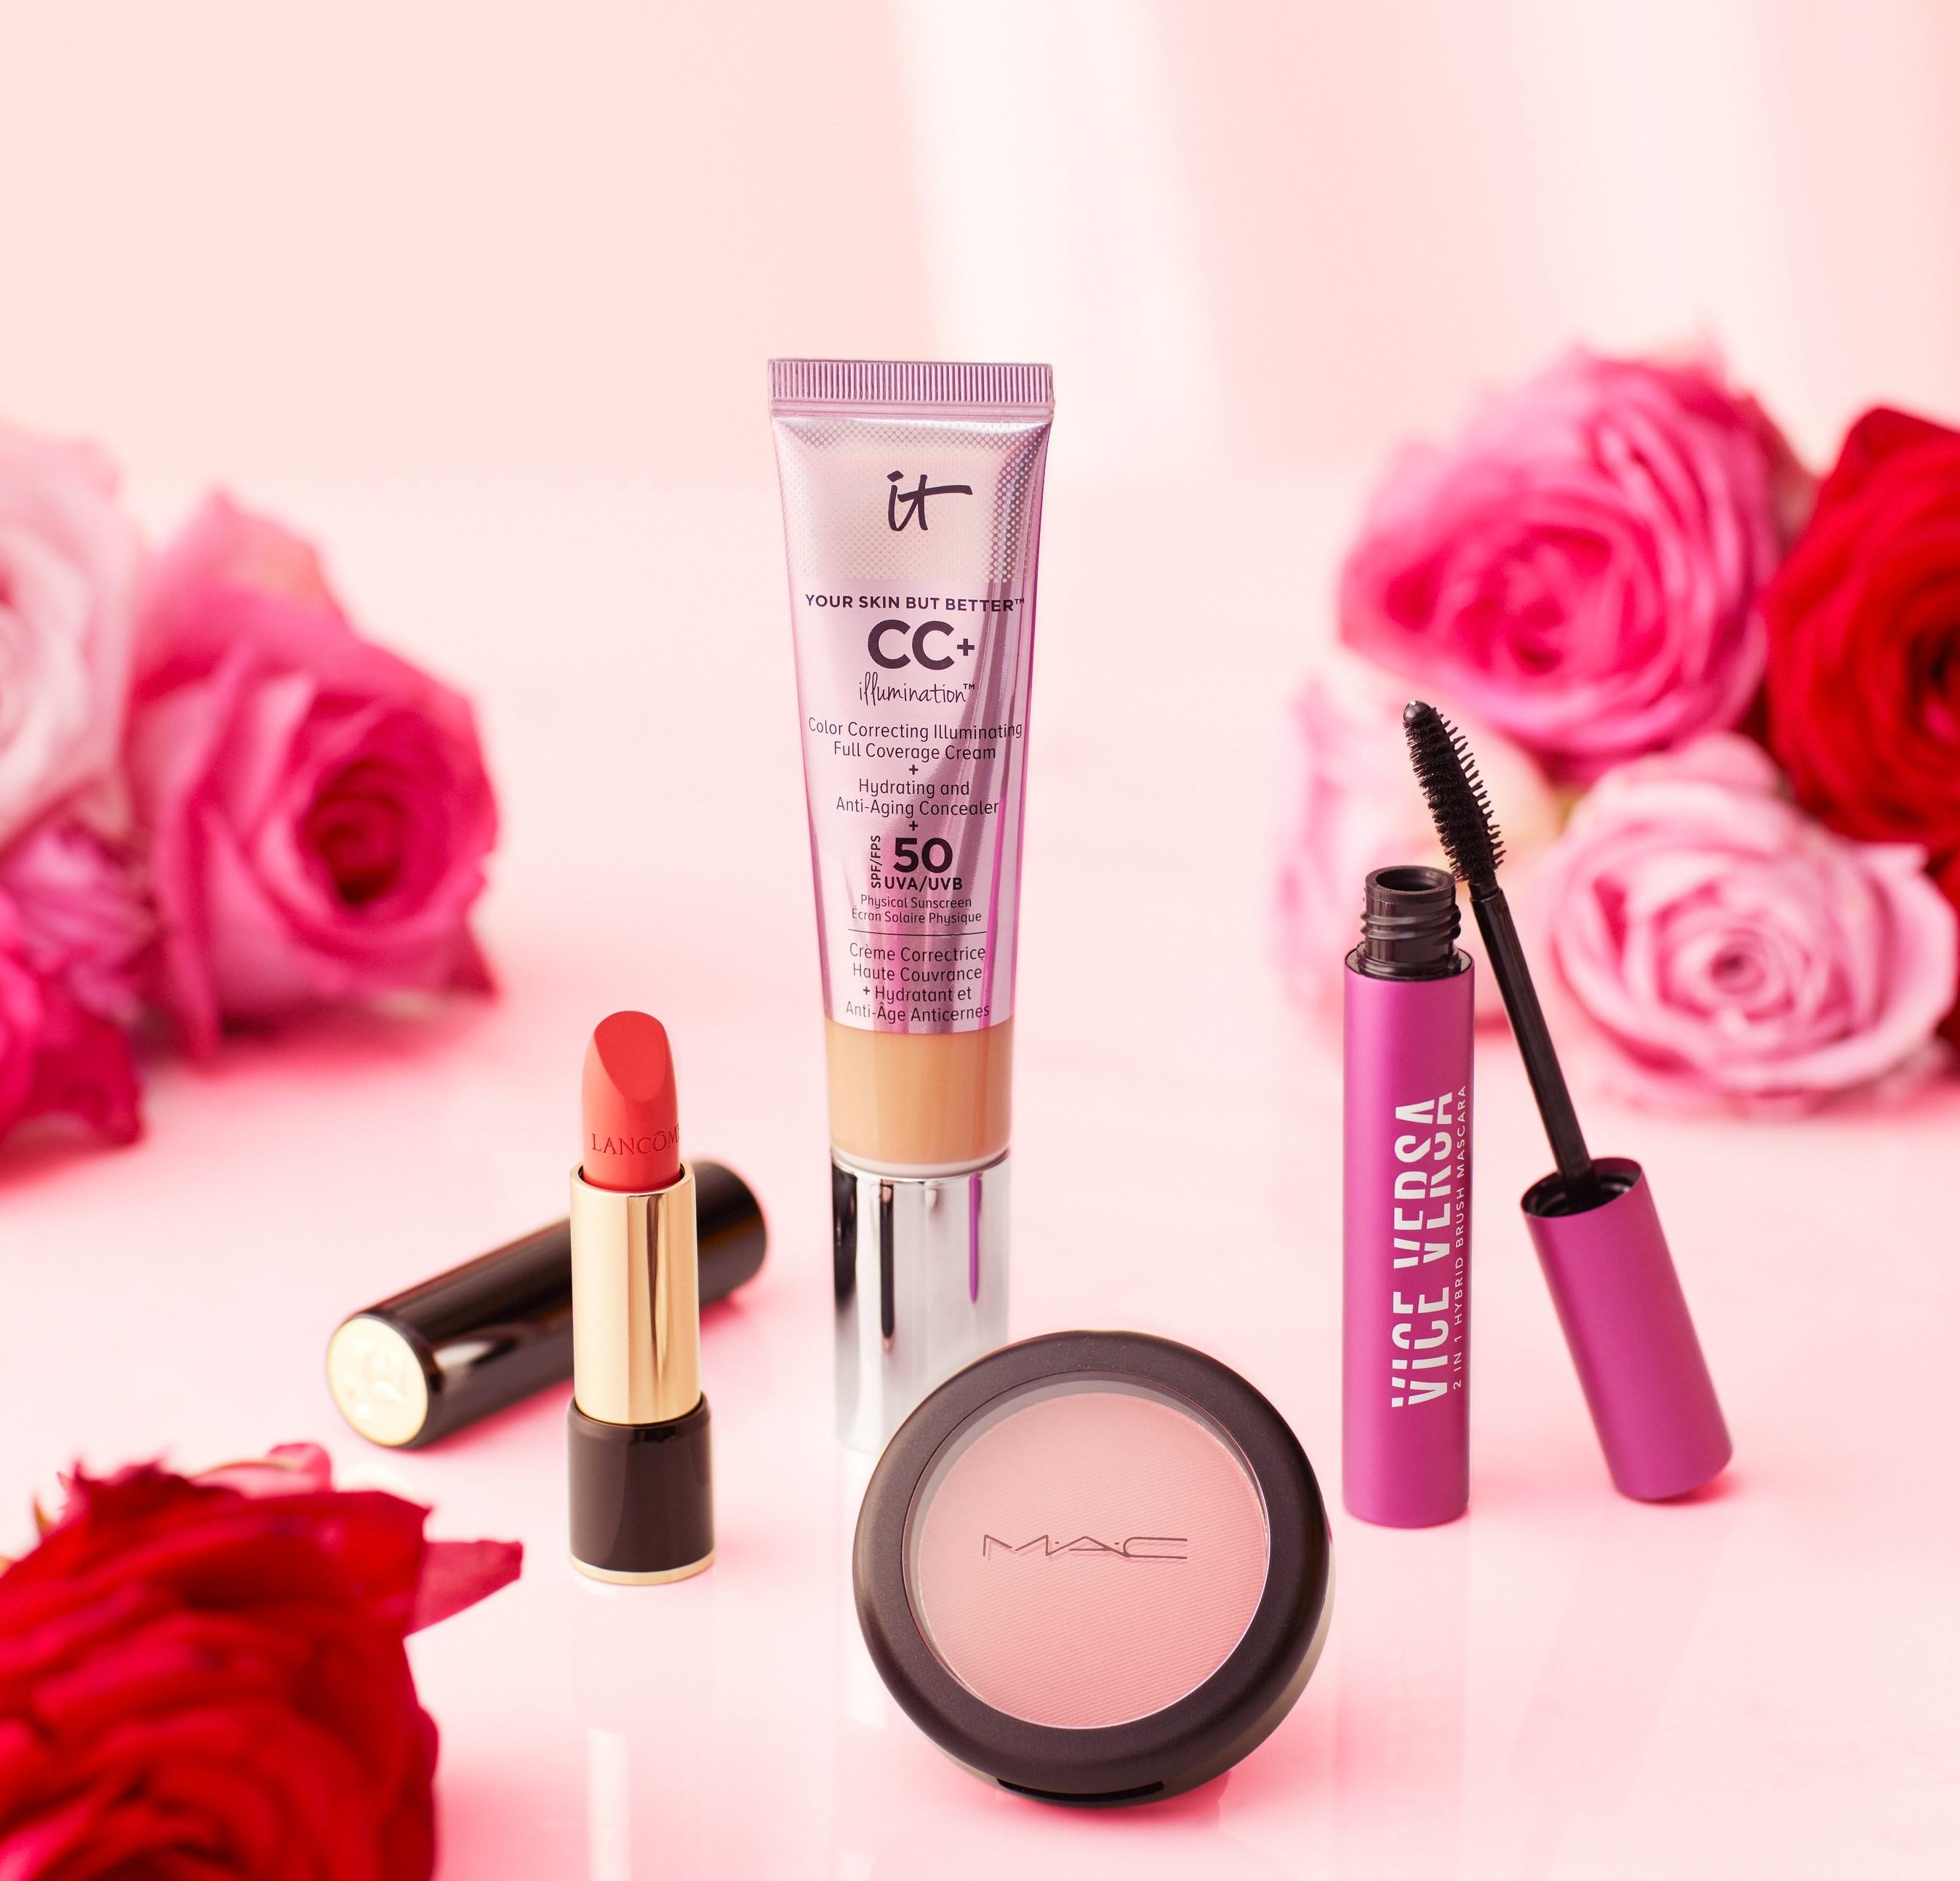 Makeup-product-valentinesday-lifestyle-orez